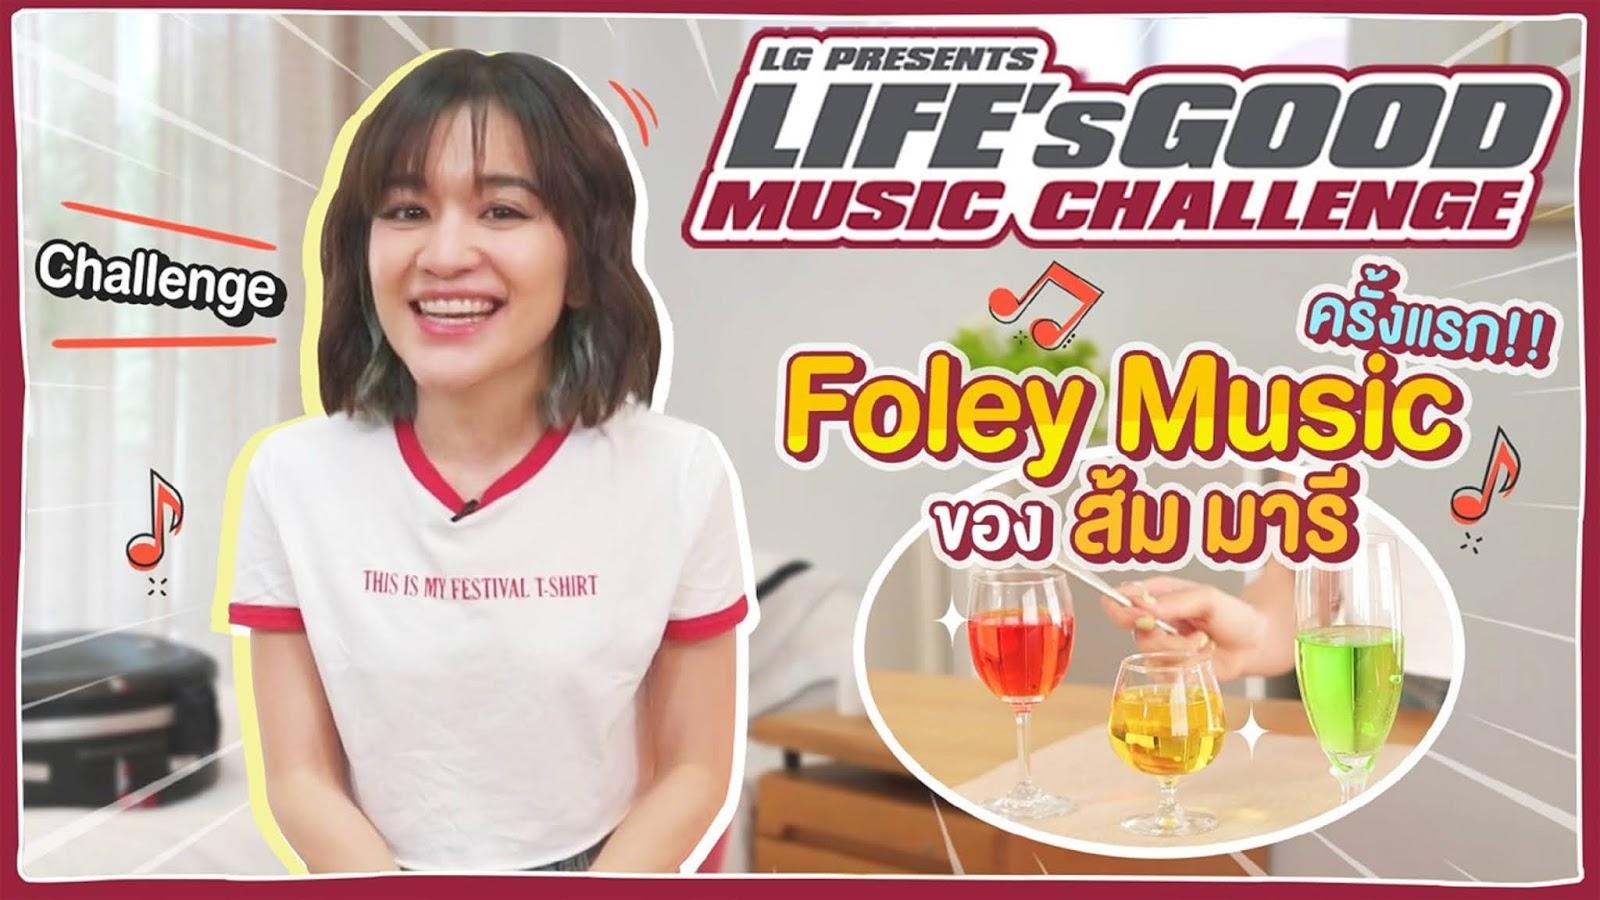 "LG นำแคมเปญระดับโลก ""Life's Good Music Challenge"" สู่ประเทศไทยนำ ส้ม มารี เชิญชวนคนรักดนตรีร่วมแต่งเพลงถ่ายทอดแนวคิด ""Life's Good"""